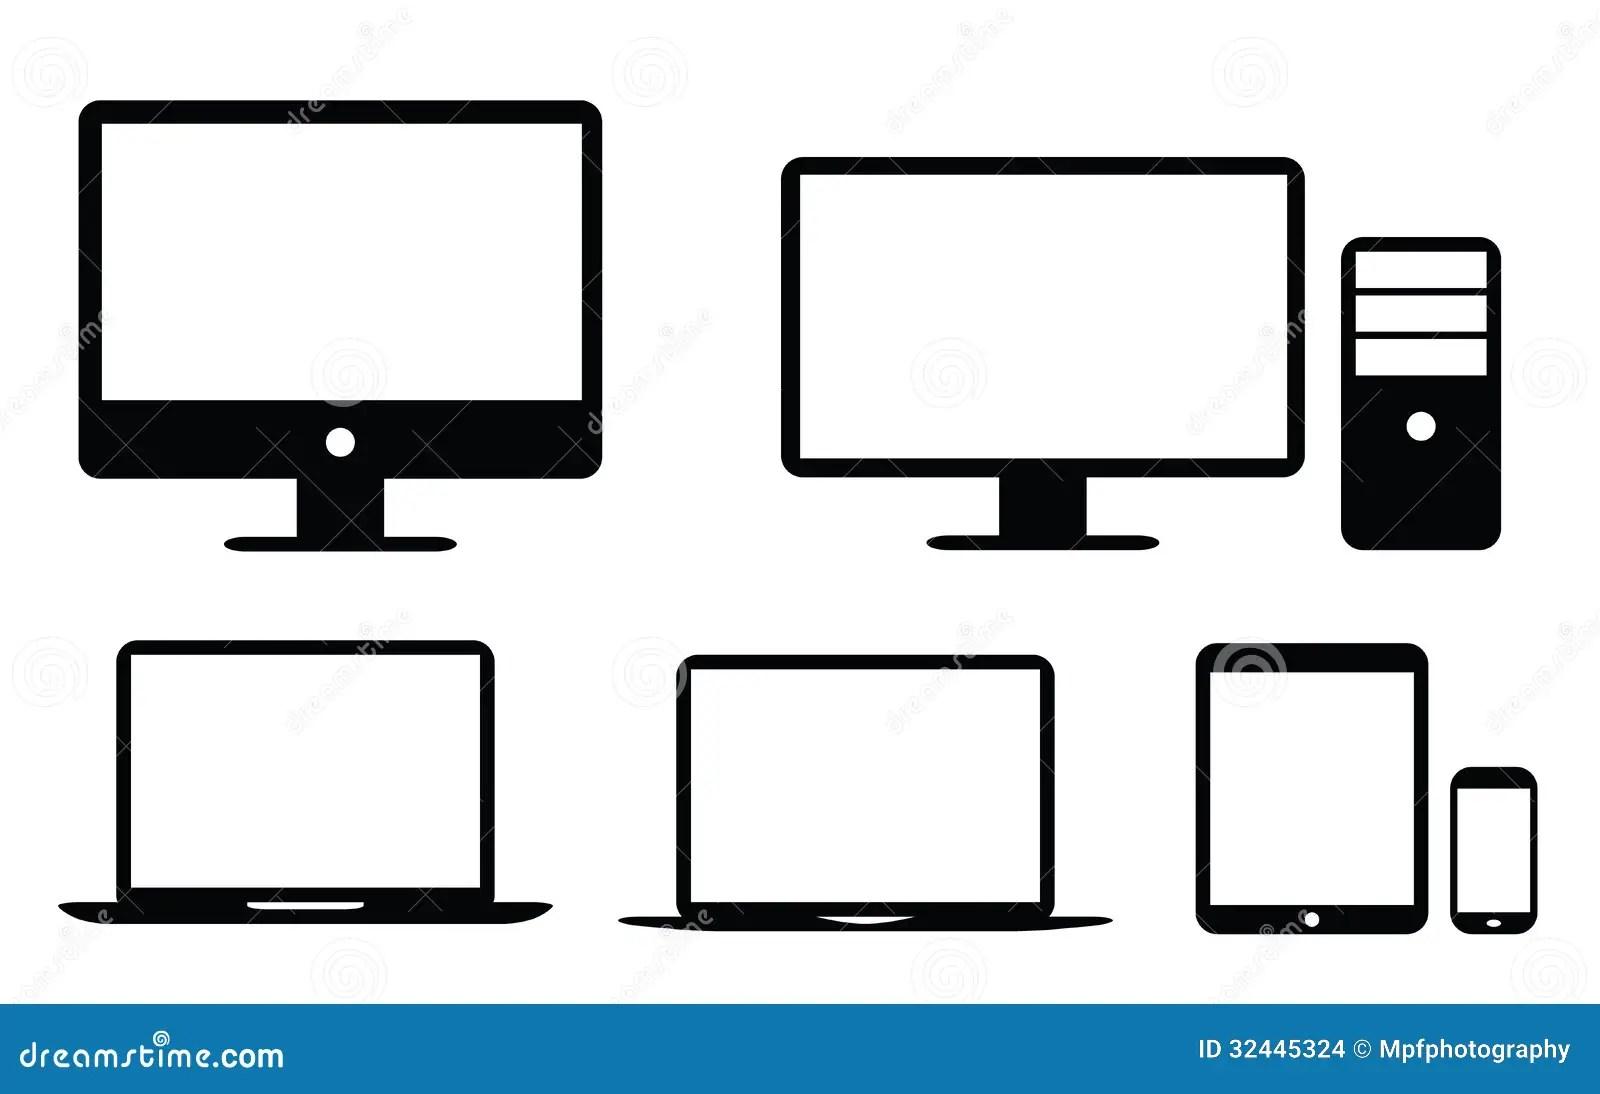 Black Flat UI Design Element Icon Vector Eps10 Stock